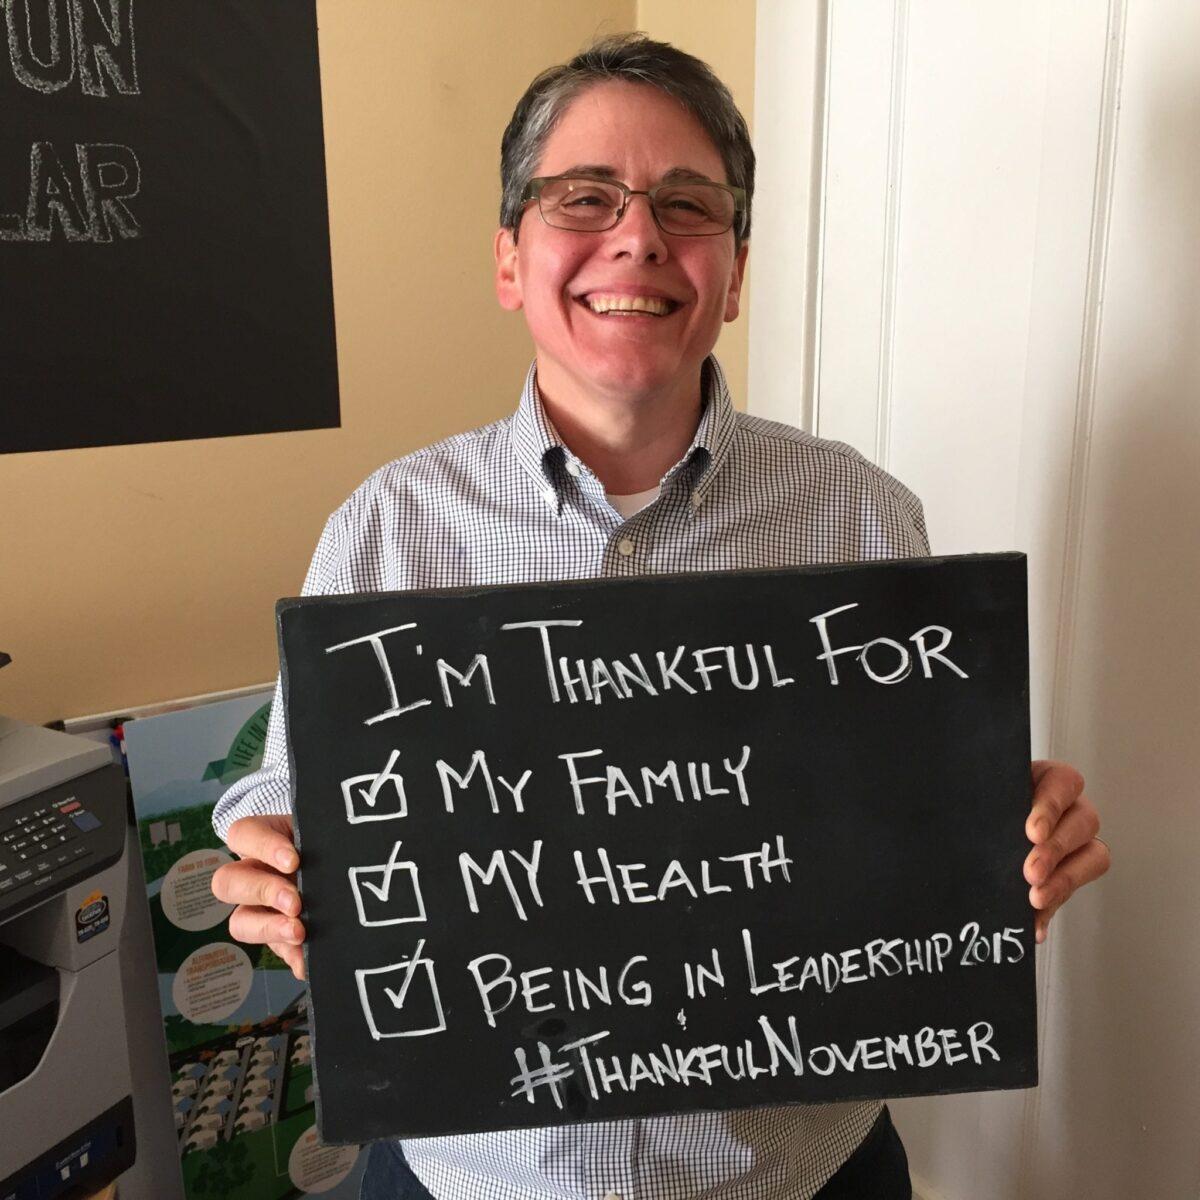 Cris Weber thankful for thanksgiving